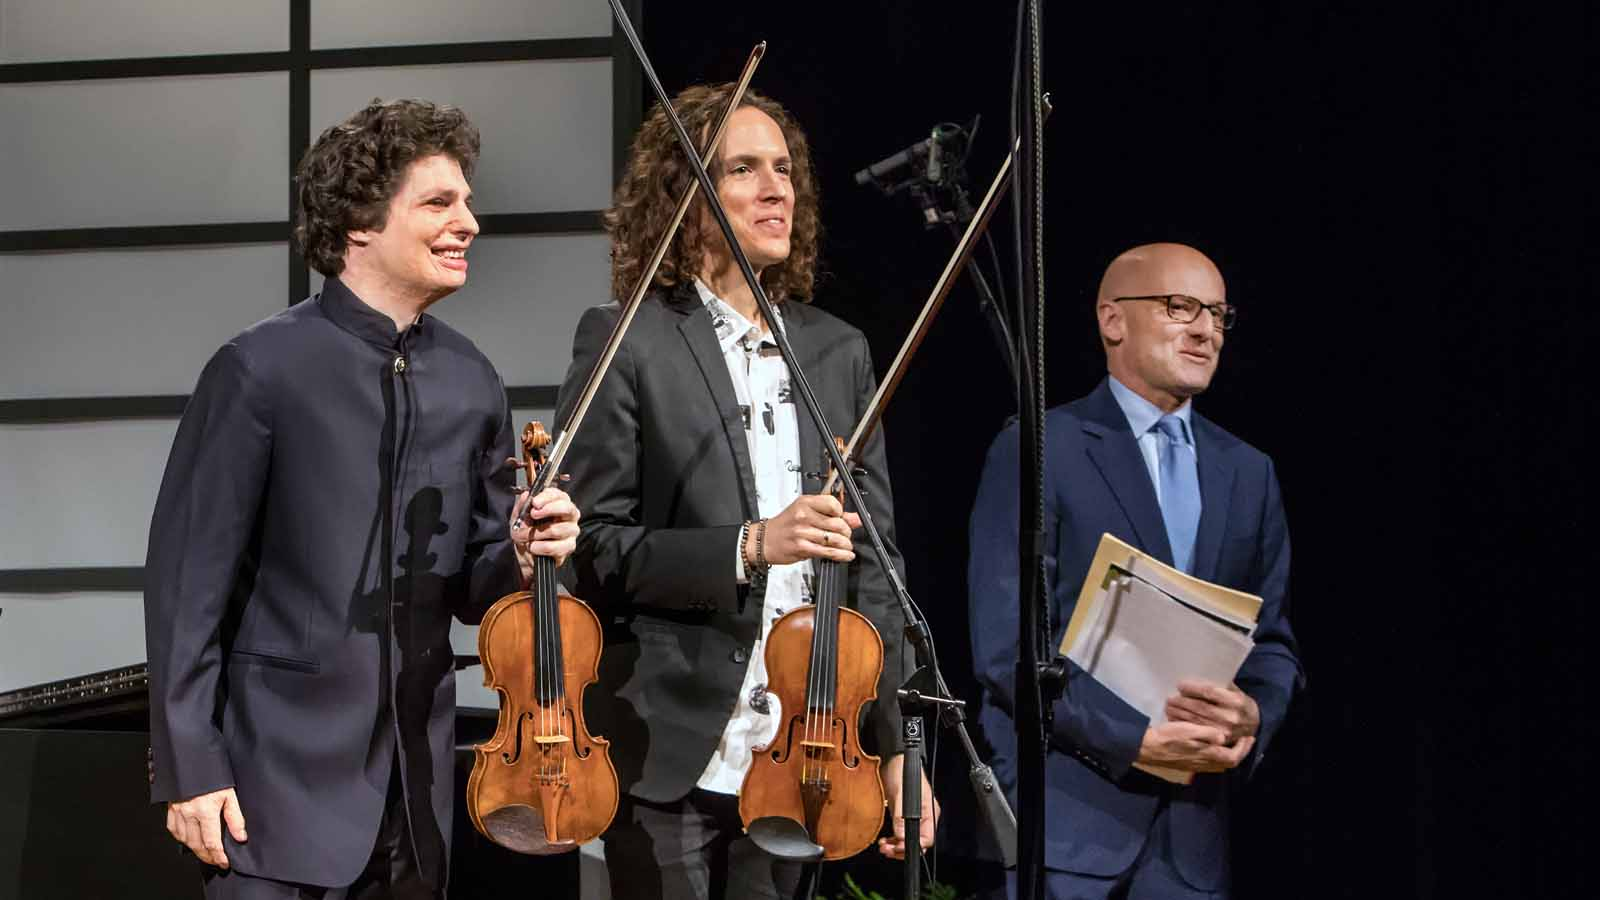 Augustin Hadelich, Tim Fain and Robert Koening.